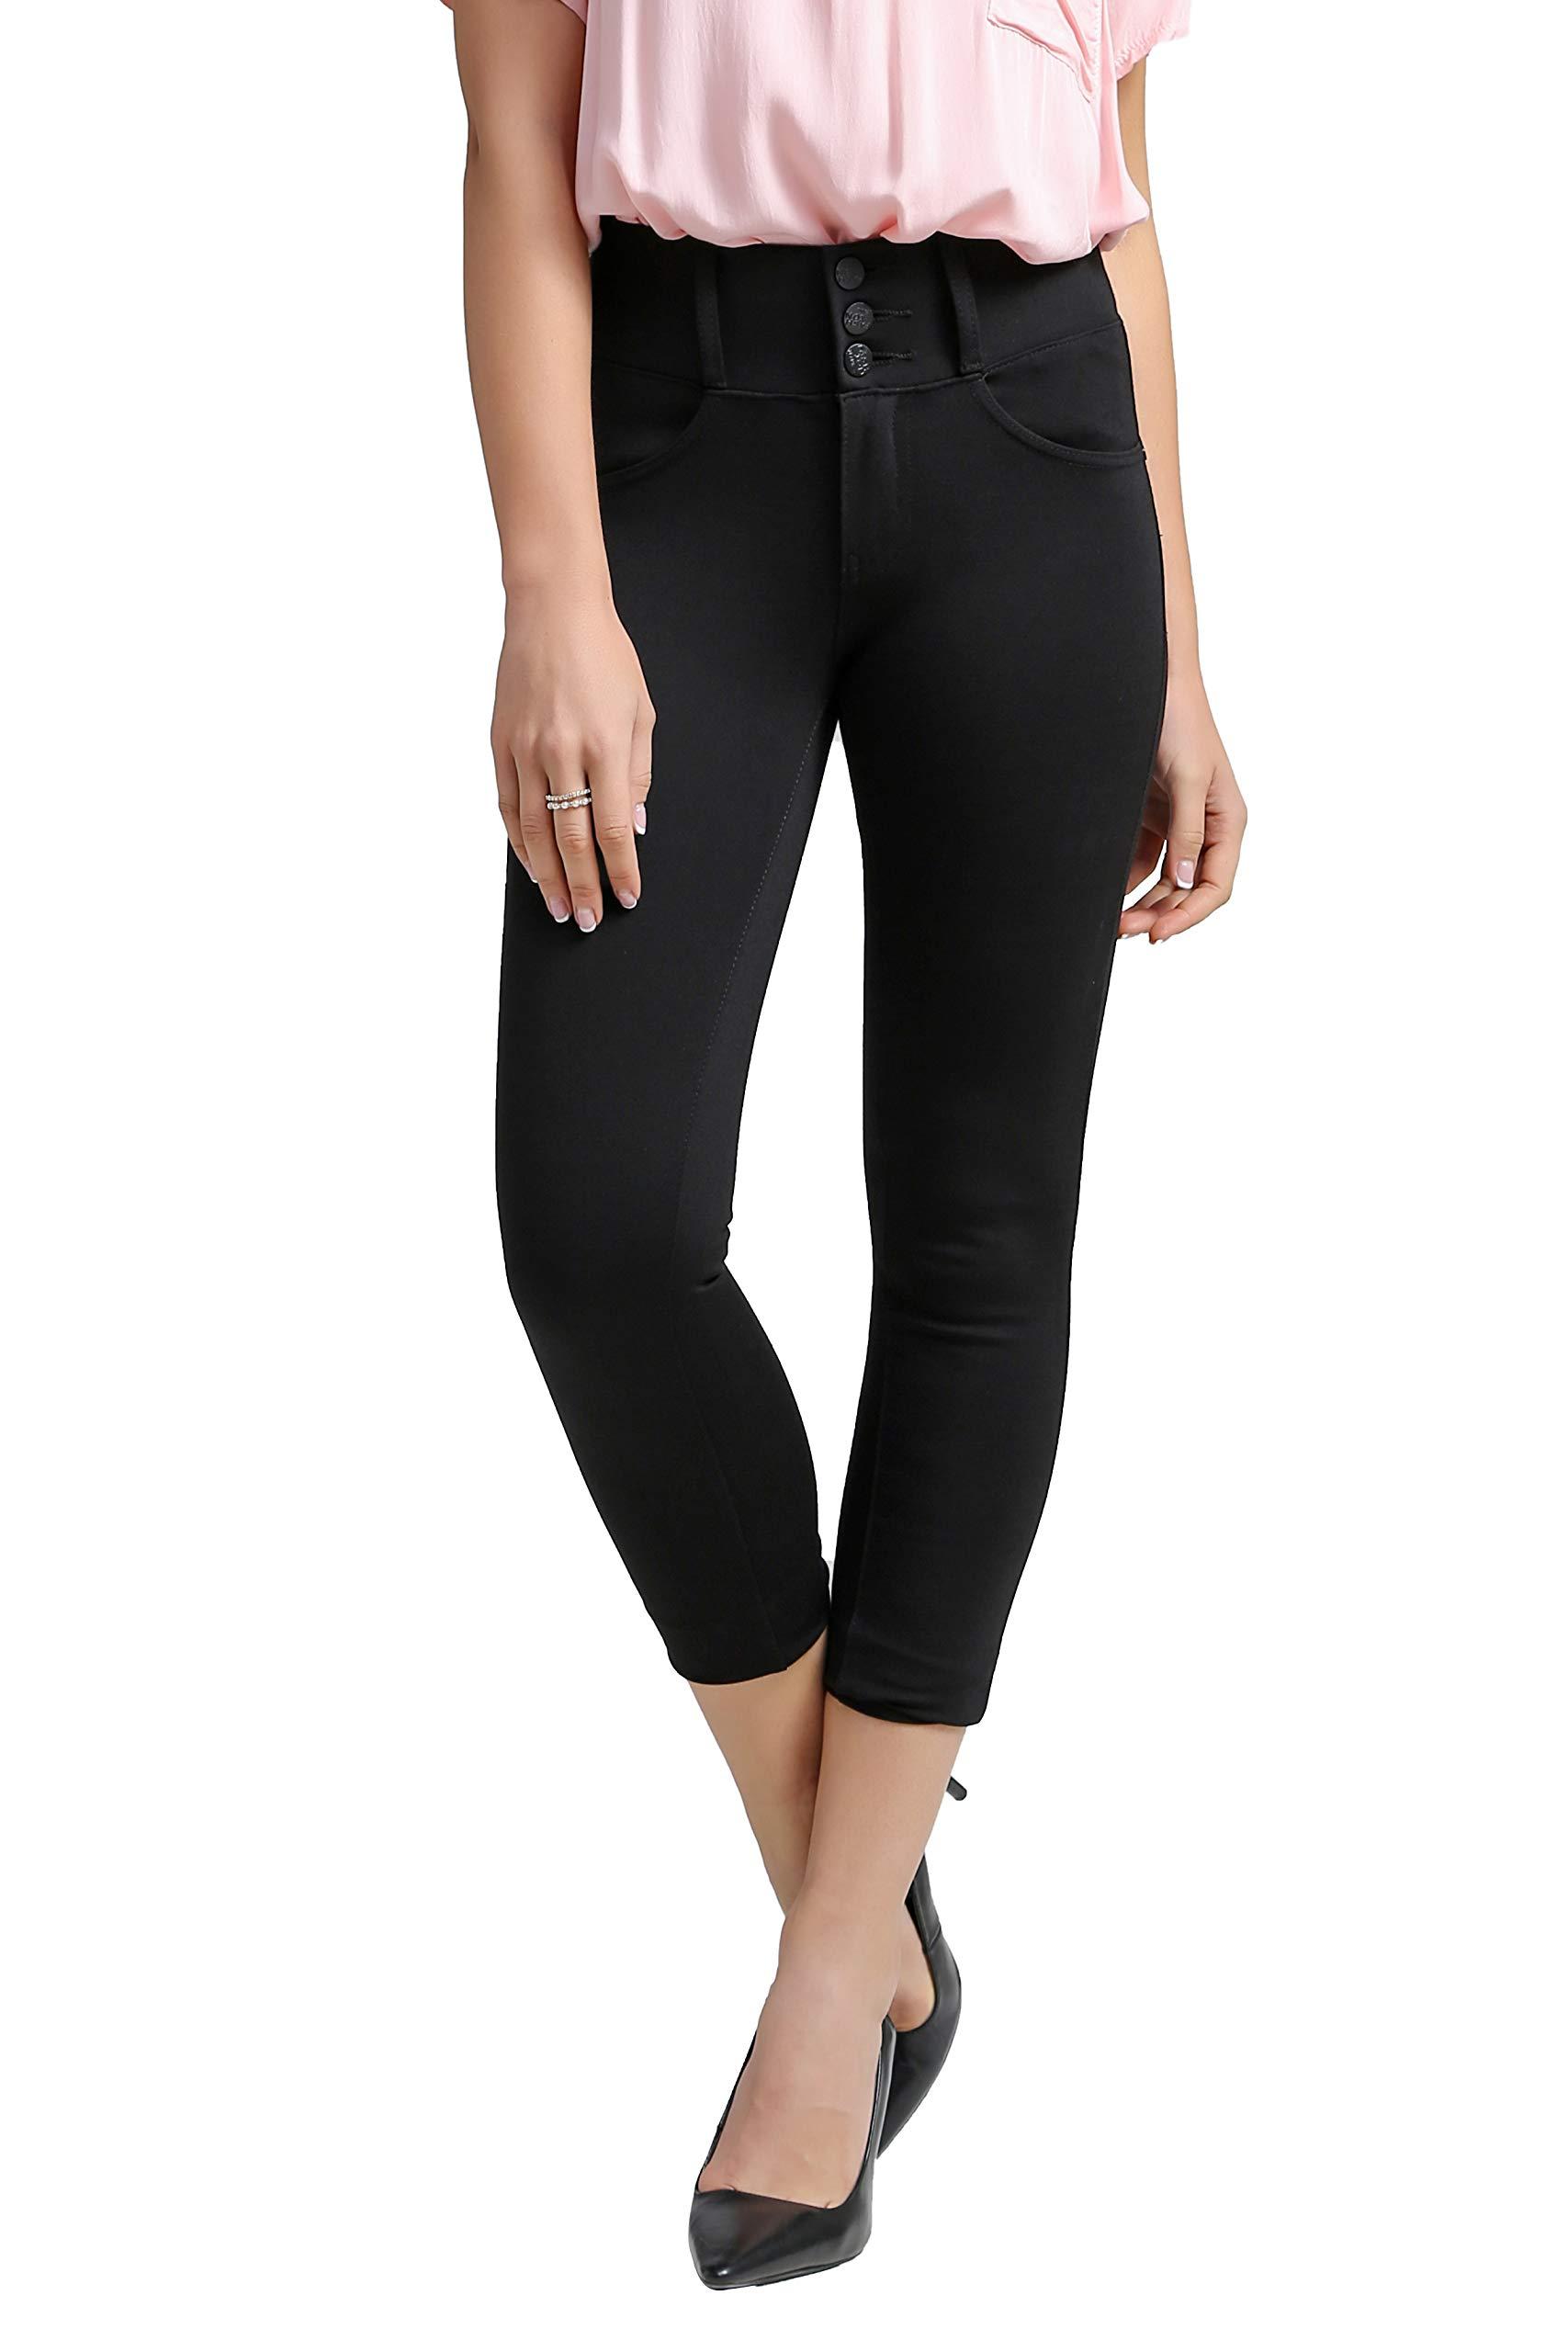 DAS Black Middle Waist Capri Leggings for Women&Skinny-Leg Casual Dailylife Pants&Workout 4 Way Stretch Yoga Capris Leggings